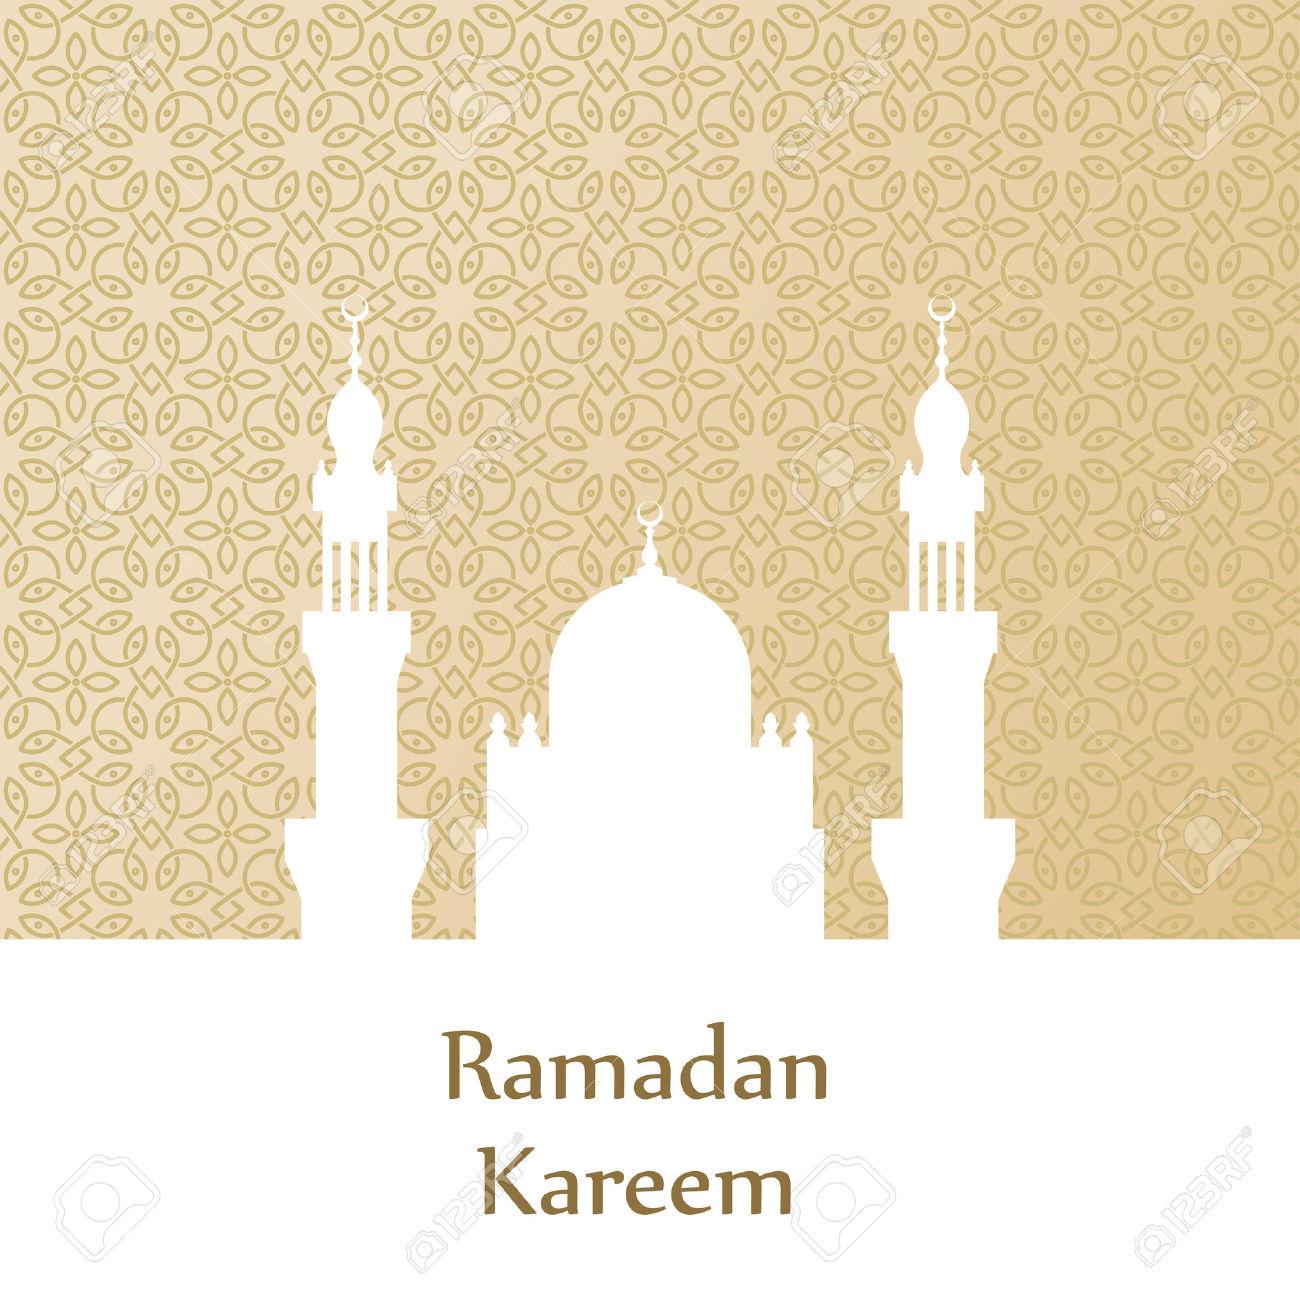 Ramadan Mubarak 2018 Ramadan Wishes Quotes Greetings 2018 The